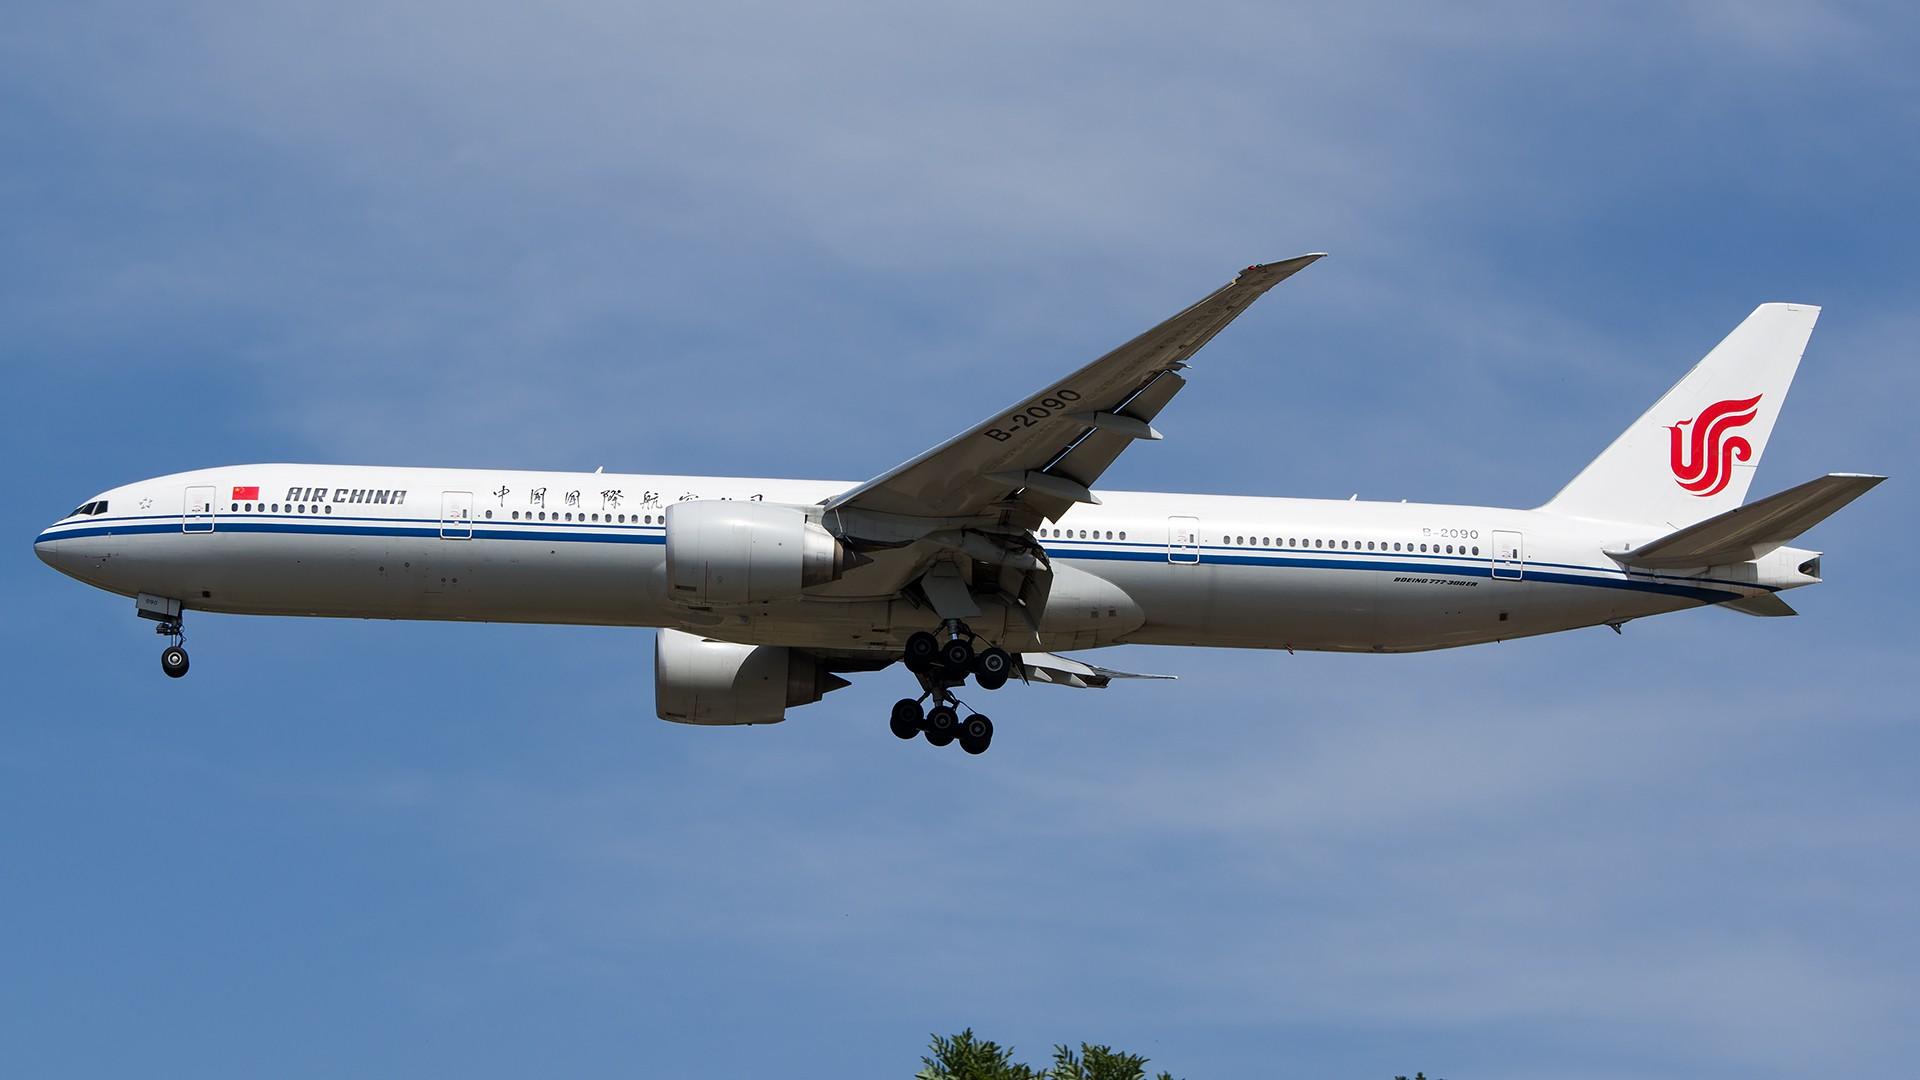 Re:[原创]PEK01午后两小时抓拍,其实是为AA的One World来的 BOEING 777-300ER B-2090 中国北京首都国际机场